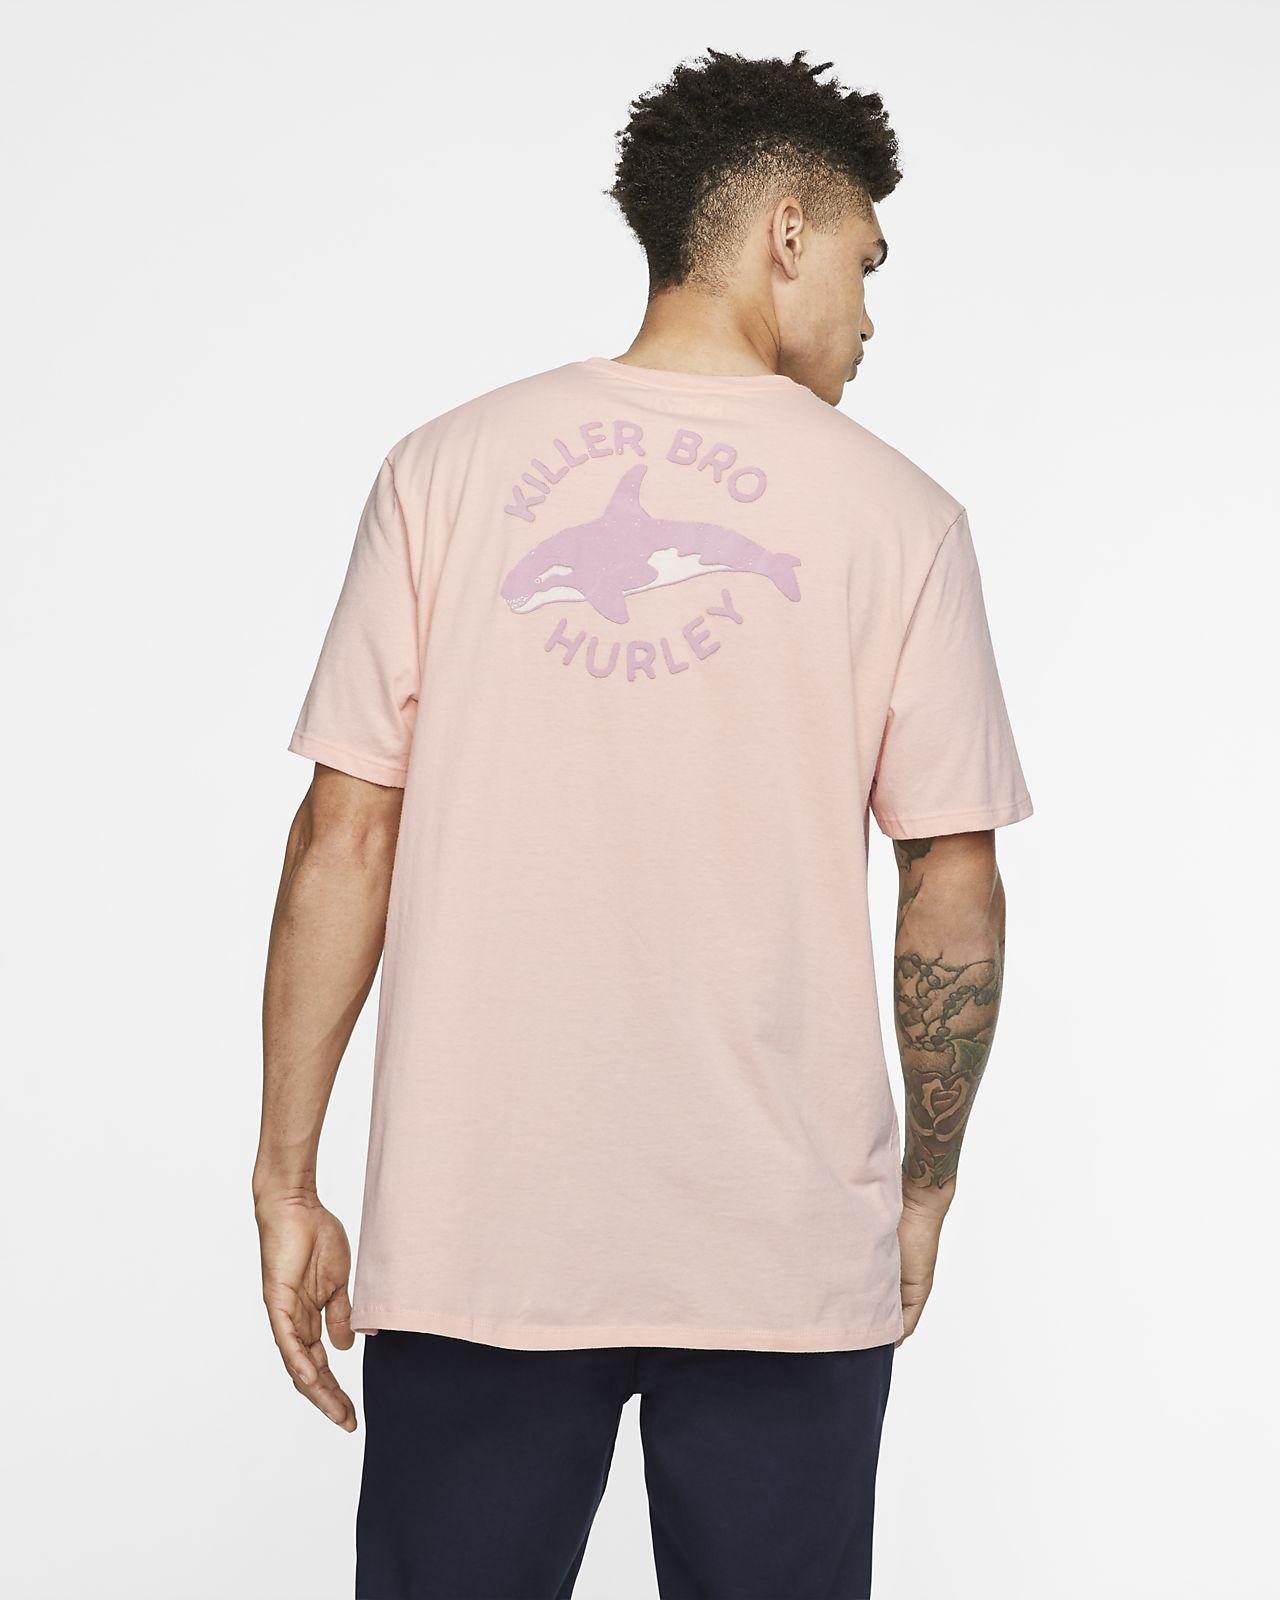 Hurley Premium Killer Bro Pocket Premium-Fit-T-Shirt für Herren